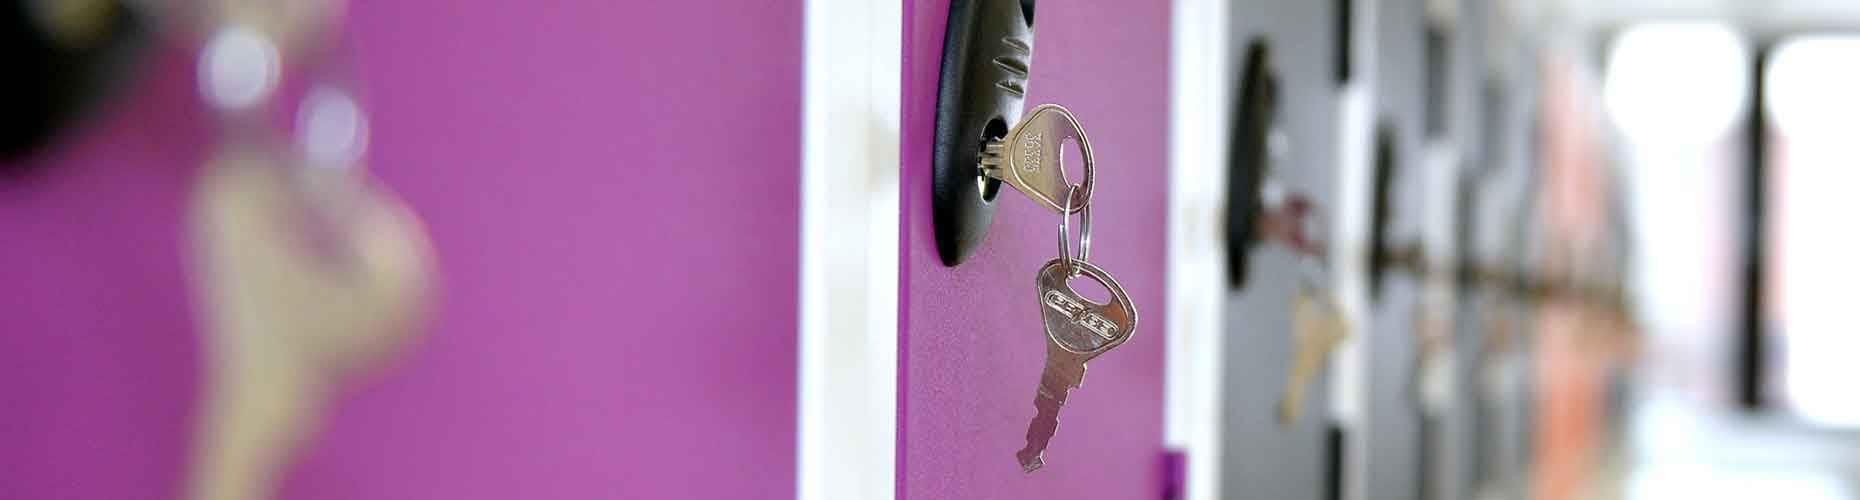 Probe Master and Service Keys